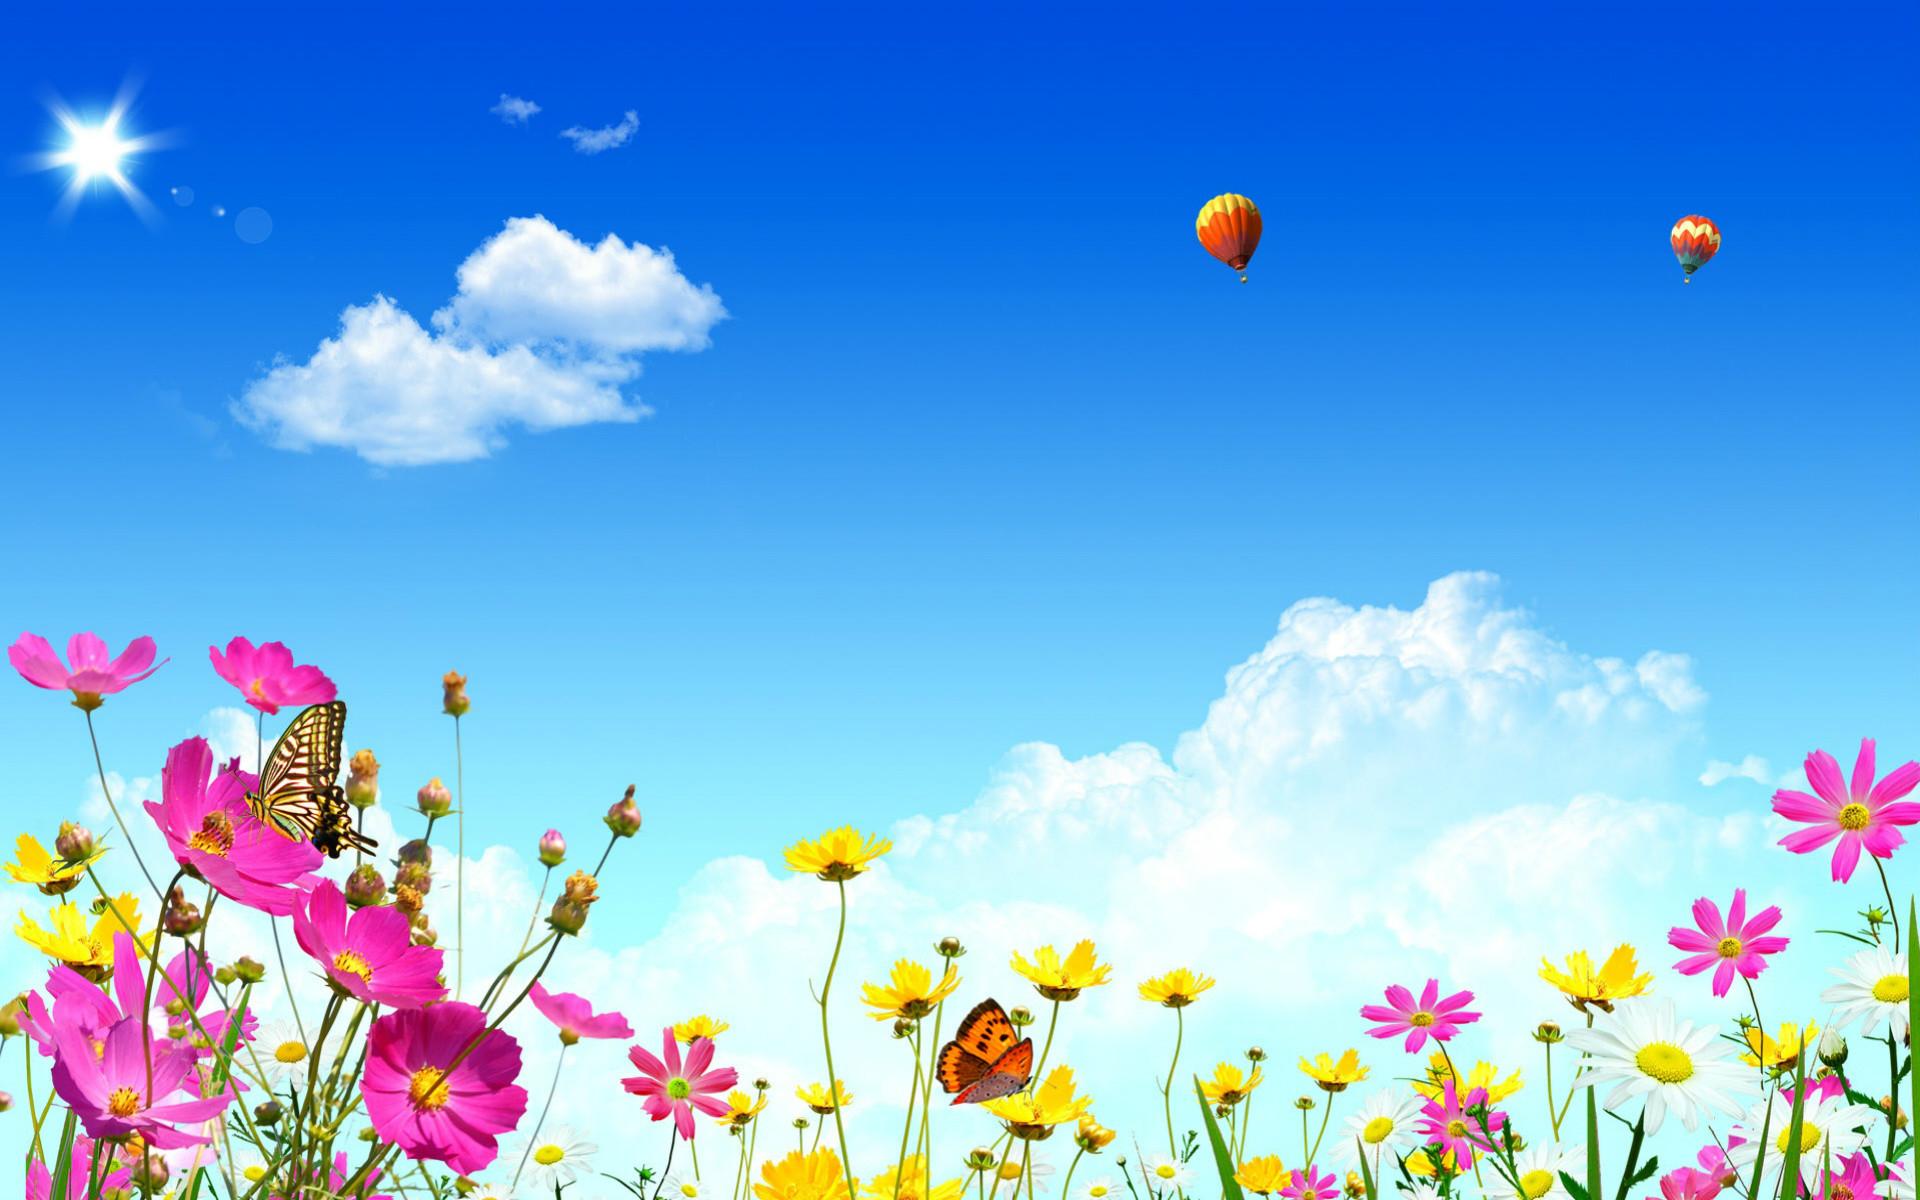 Spring Pictures For Desktop Background 75 Pictures